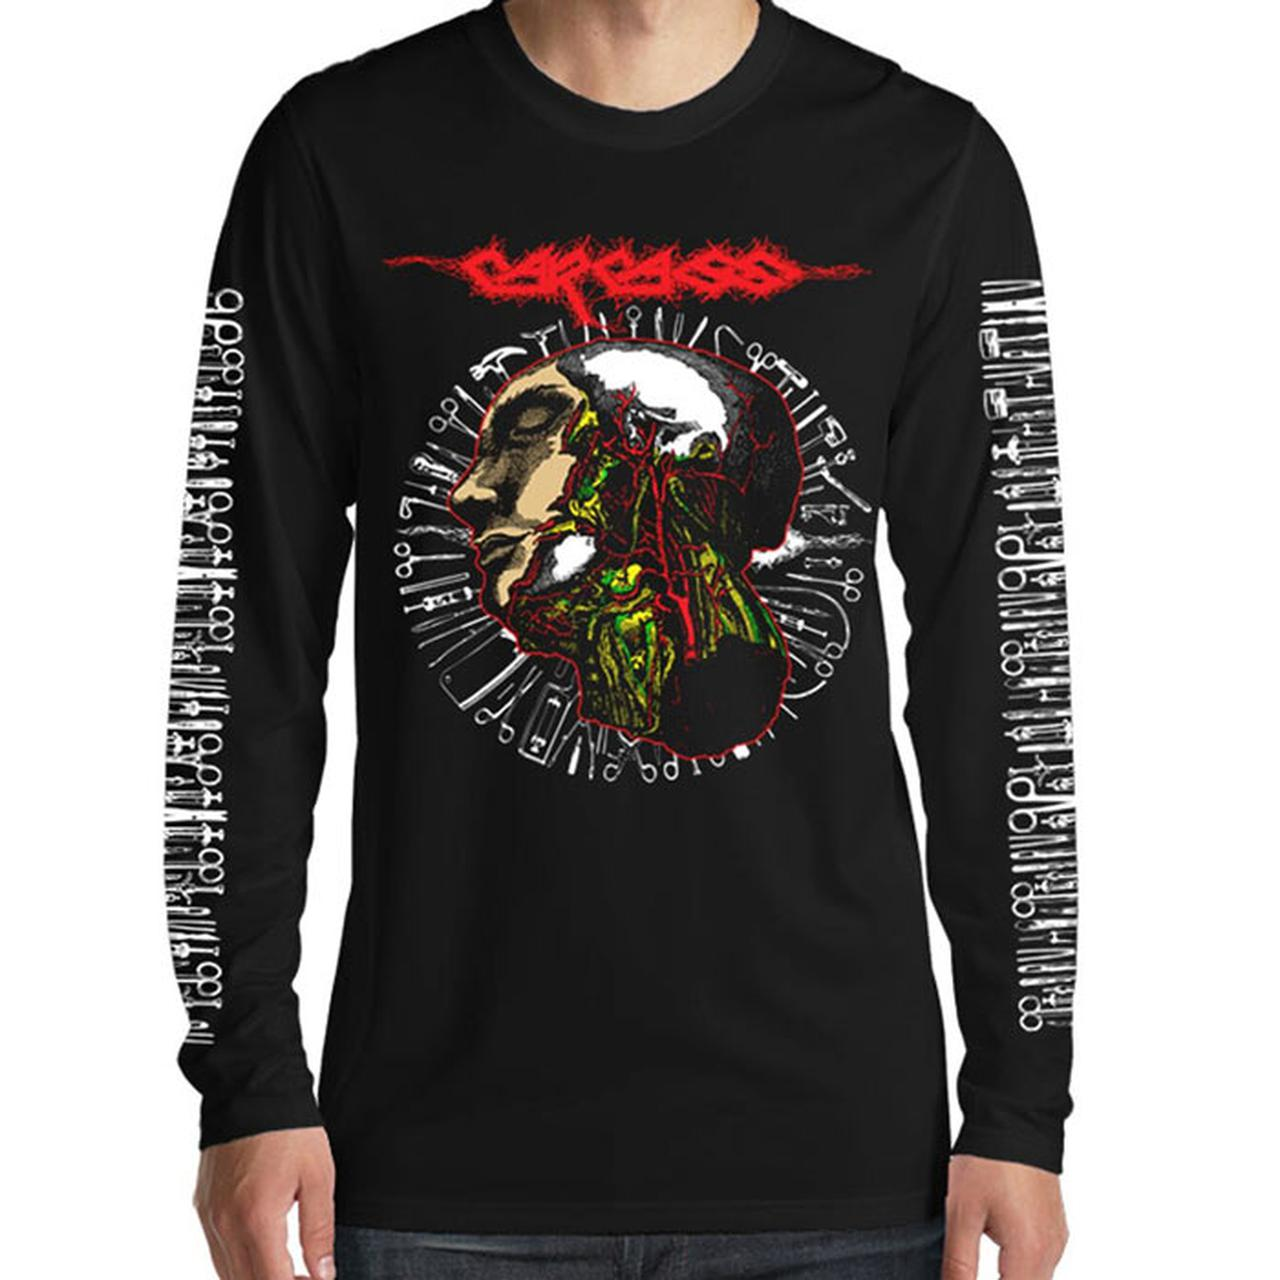 Carcass Anatomy Head Tools 2016 Tour Long Sleeve Tee